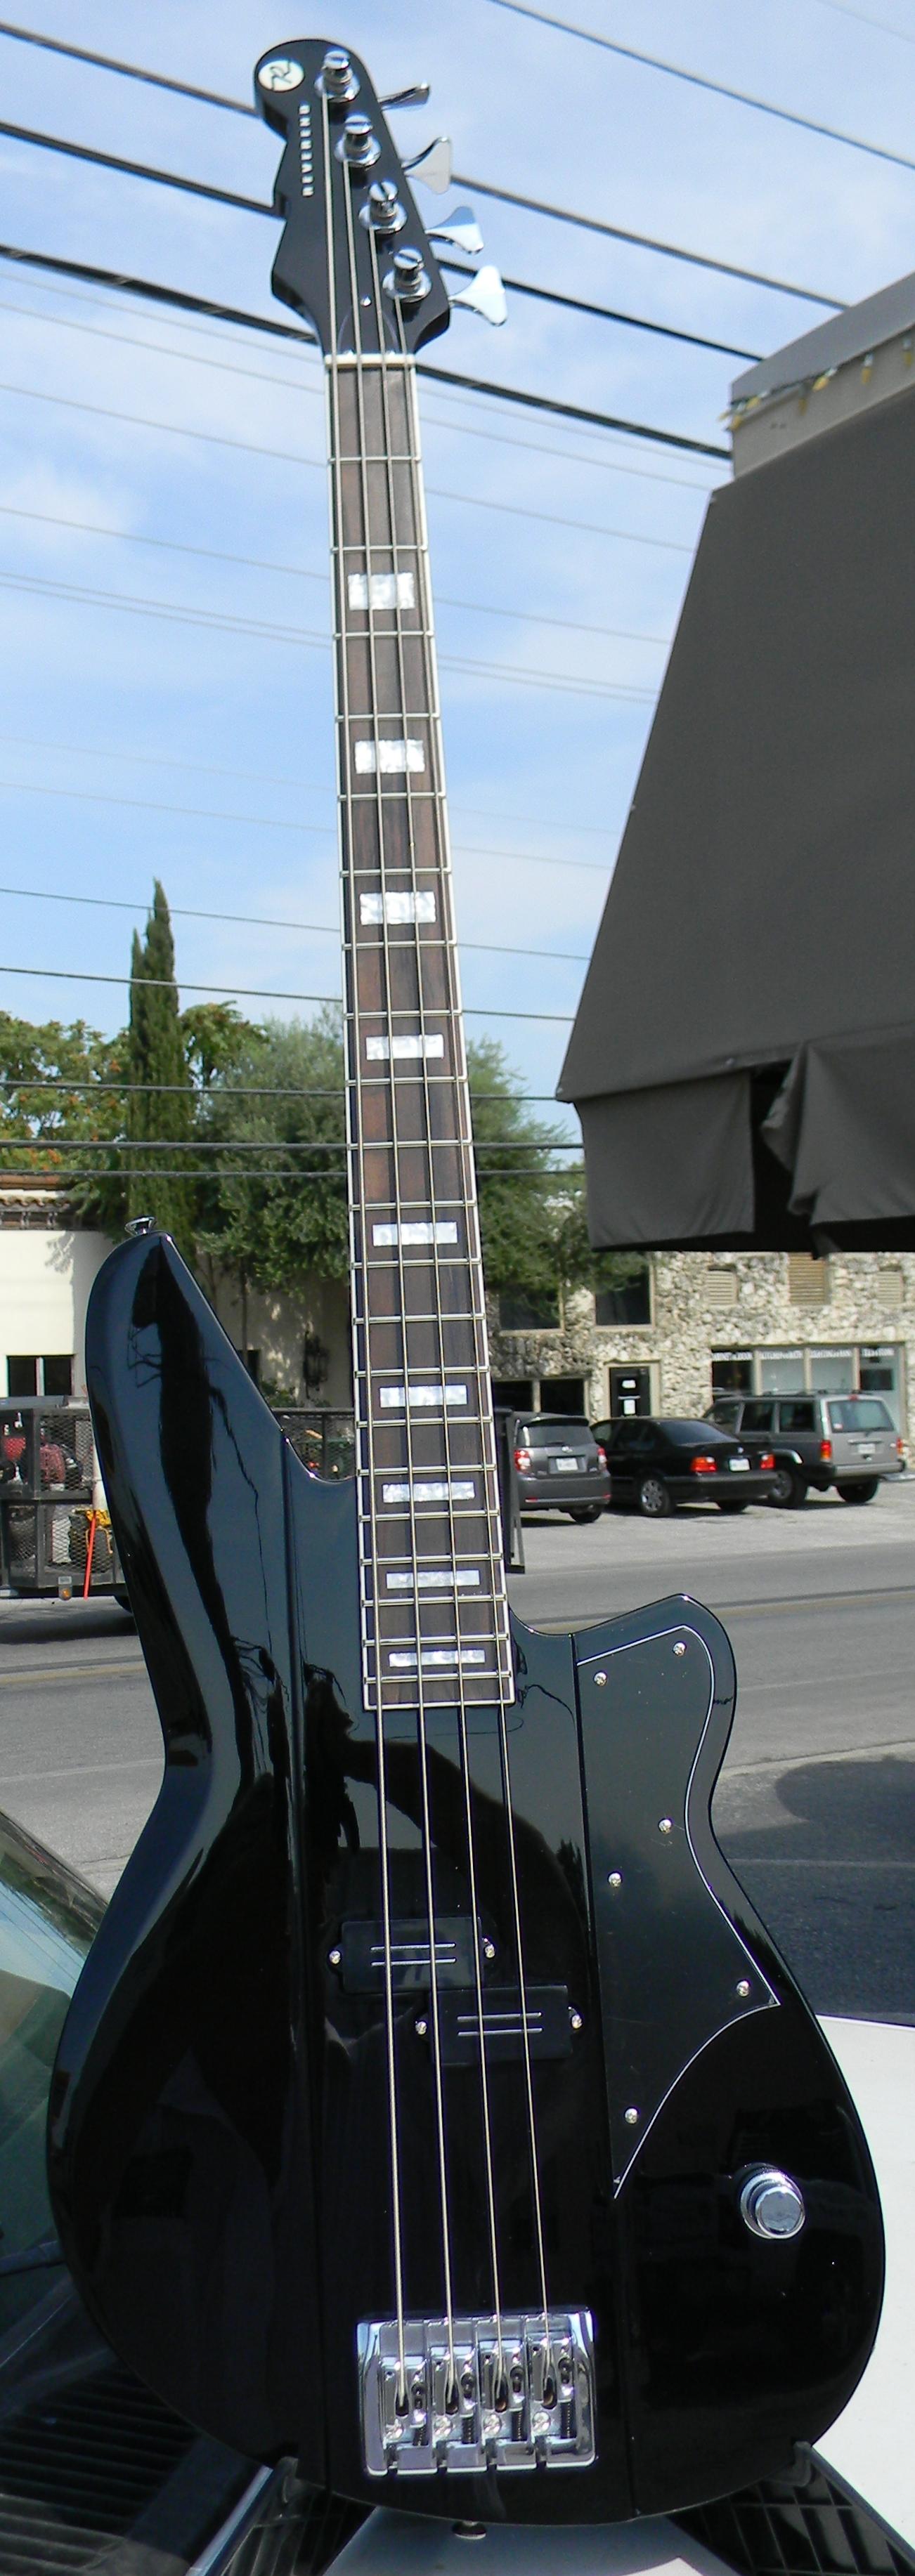 reverend guitars san antonio guitar store guitar tex. Black Bedroom Furniture Sets. Home Design Ideas